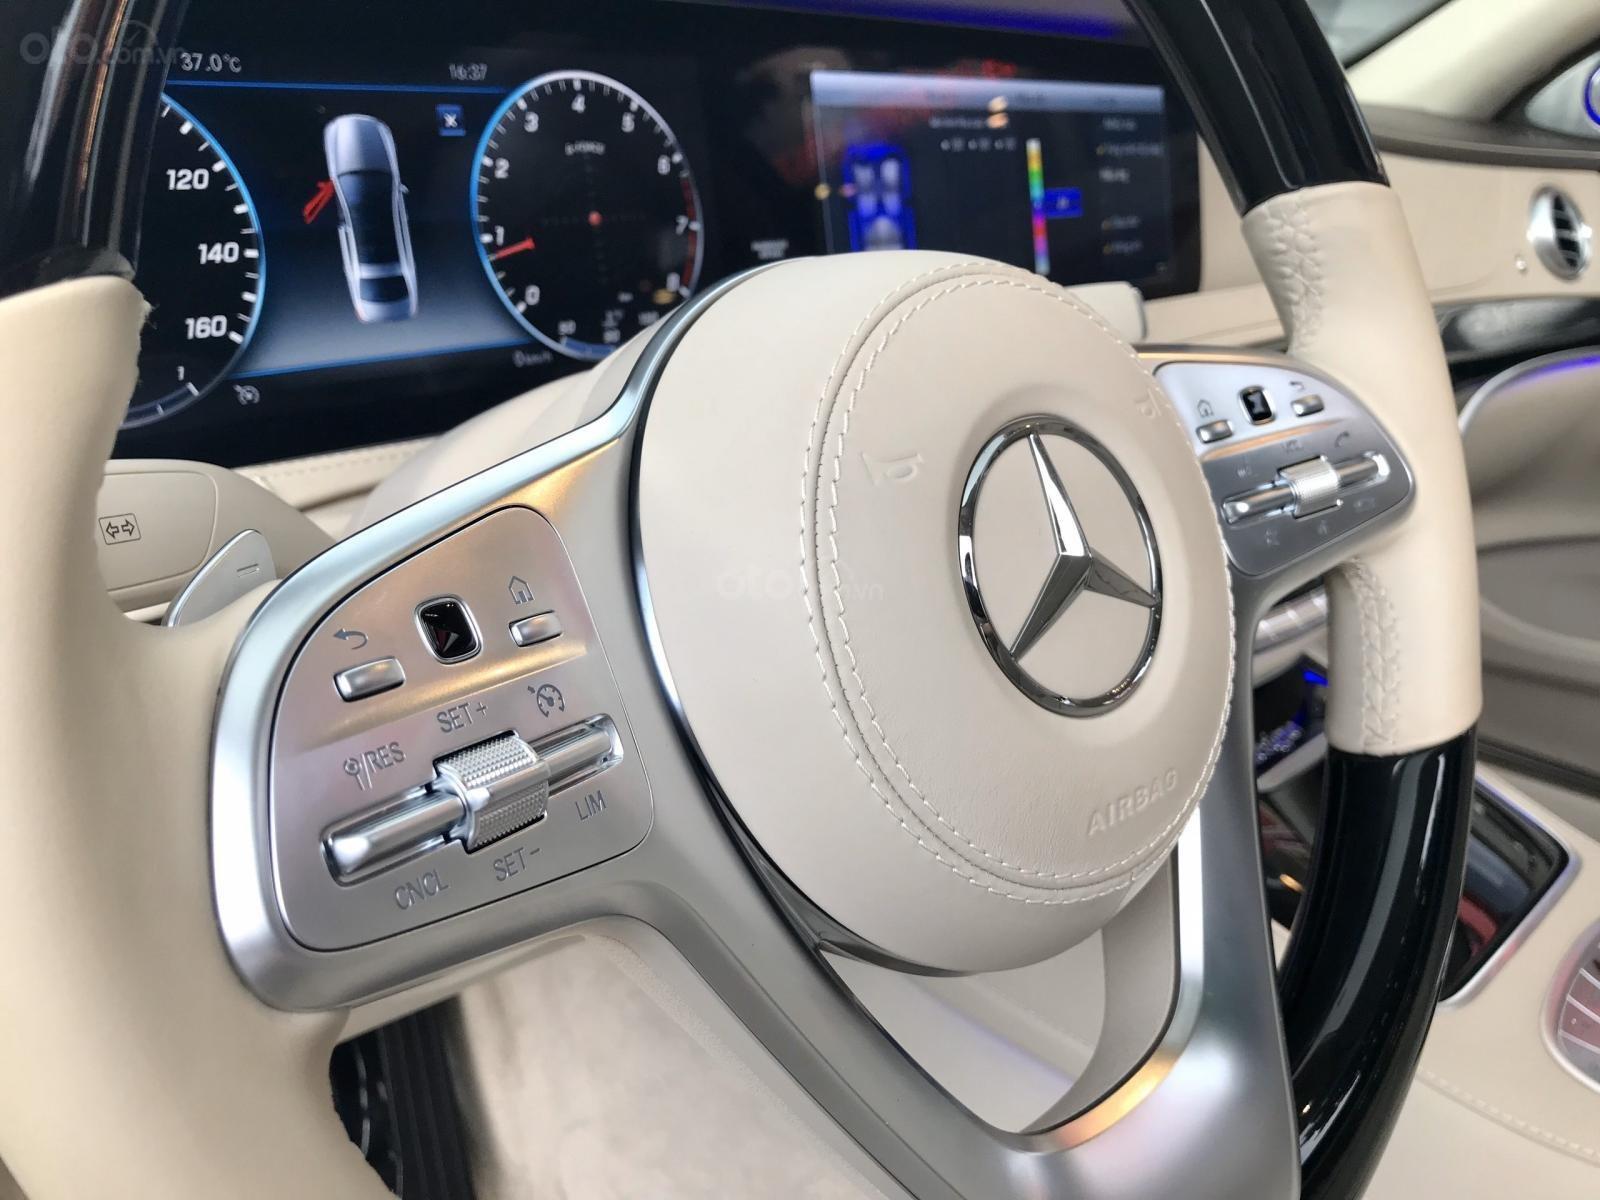 Mercedes Benz S450 Luxury sản xuất 2019 (6)